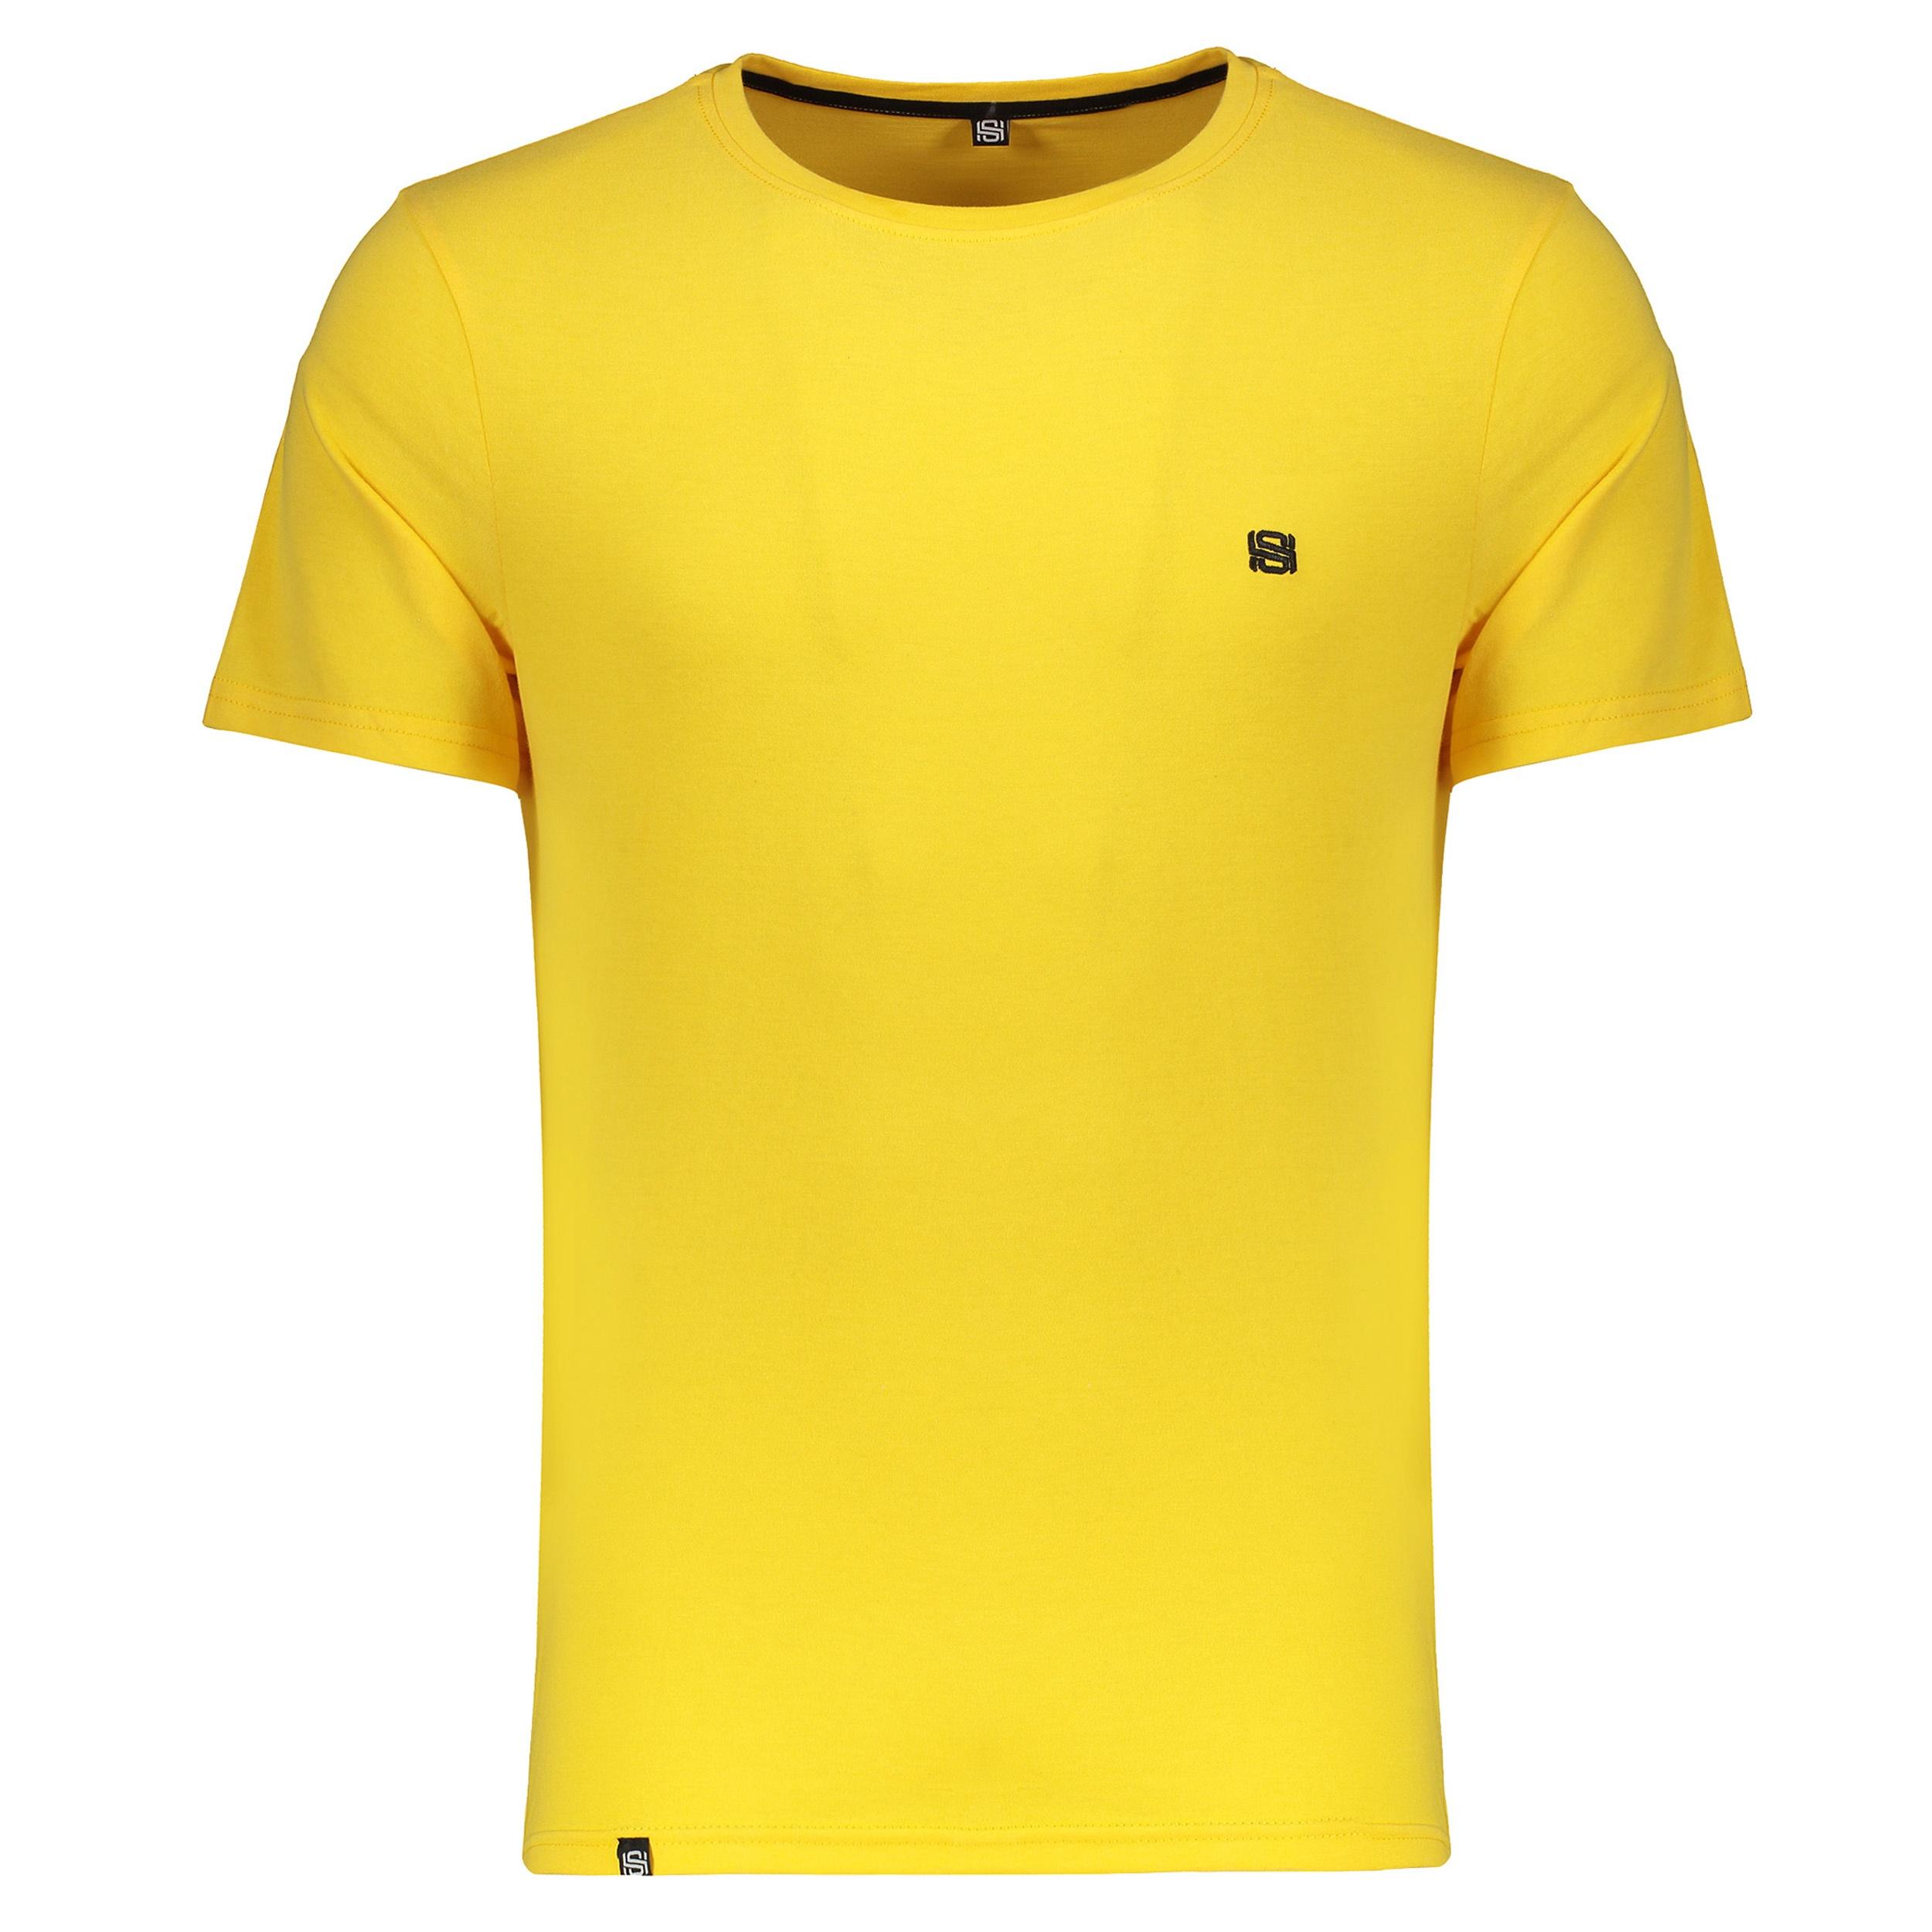 تیشرت مردانه شرافیت کد 020 رنگ زرد